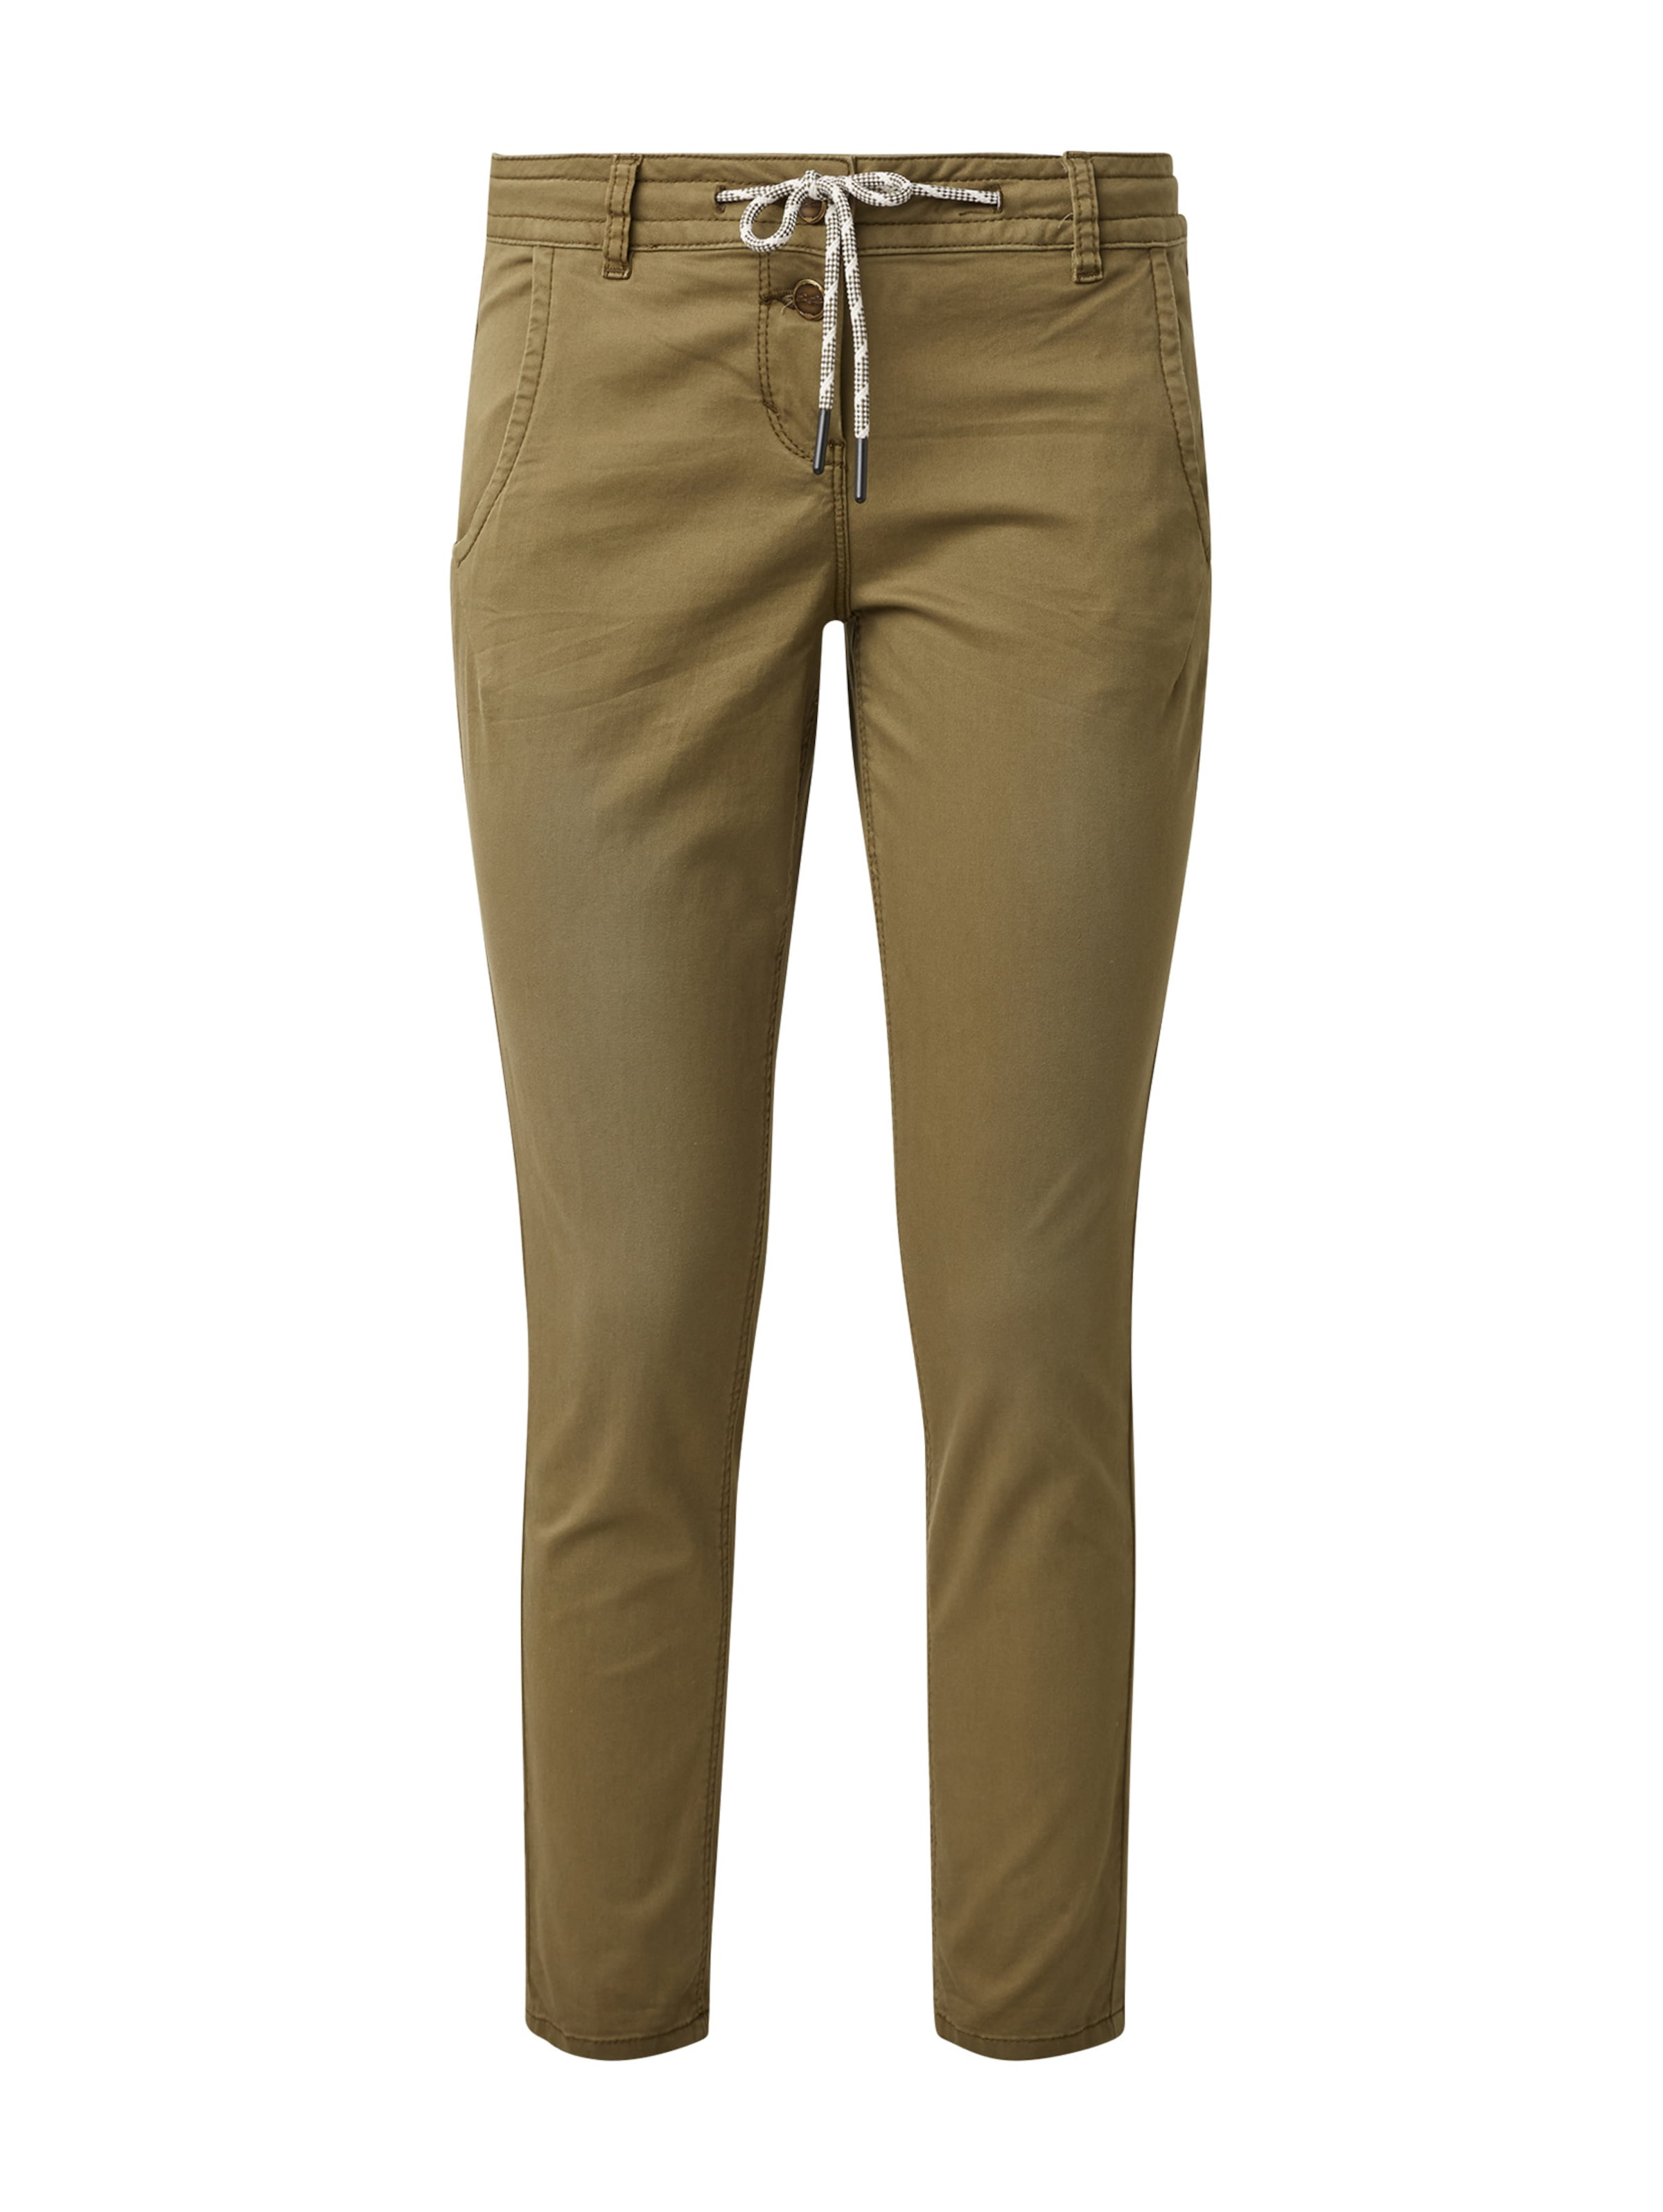 Tom En Pantalon Tailor Bleu Marine xBrshQdCot